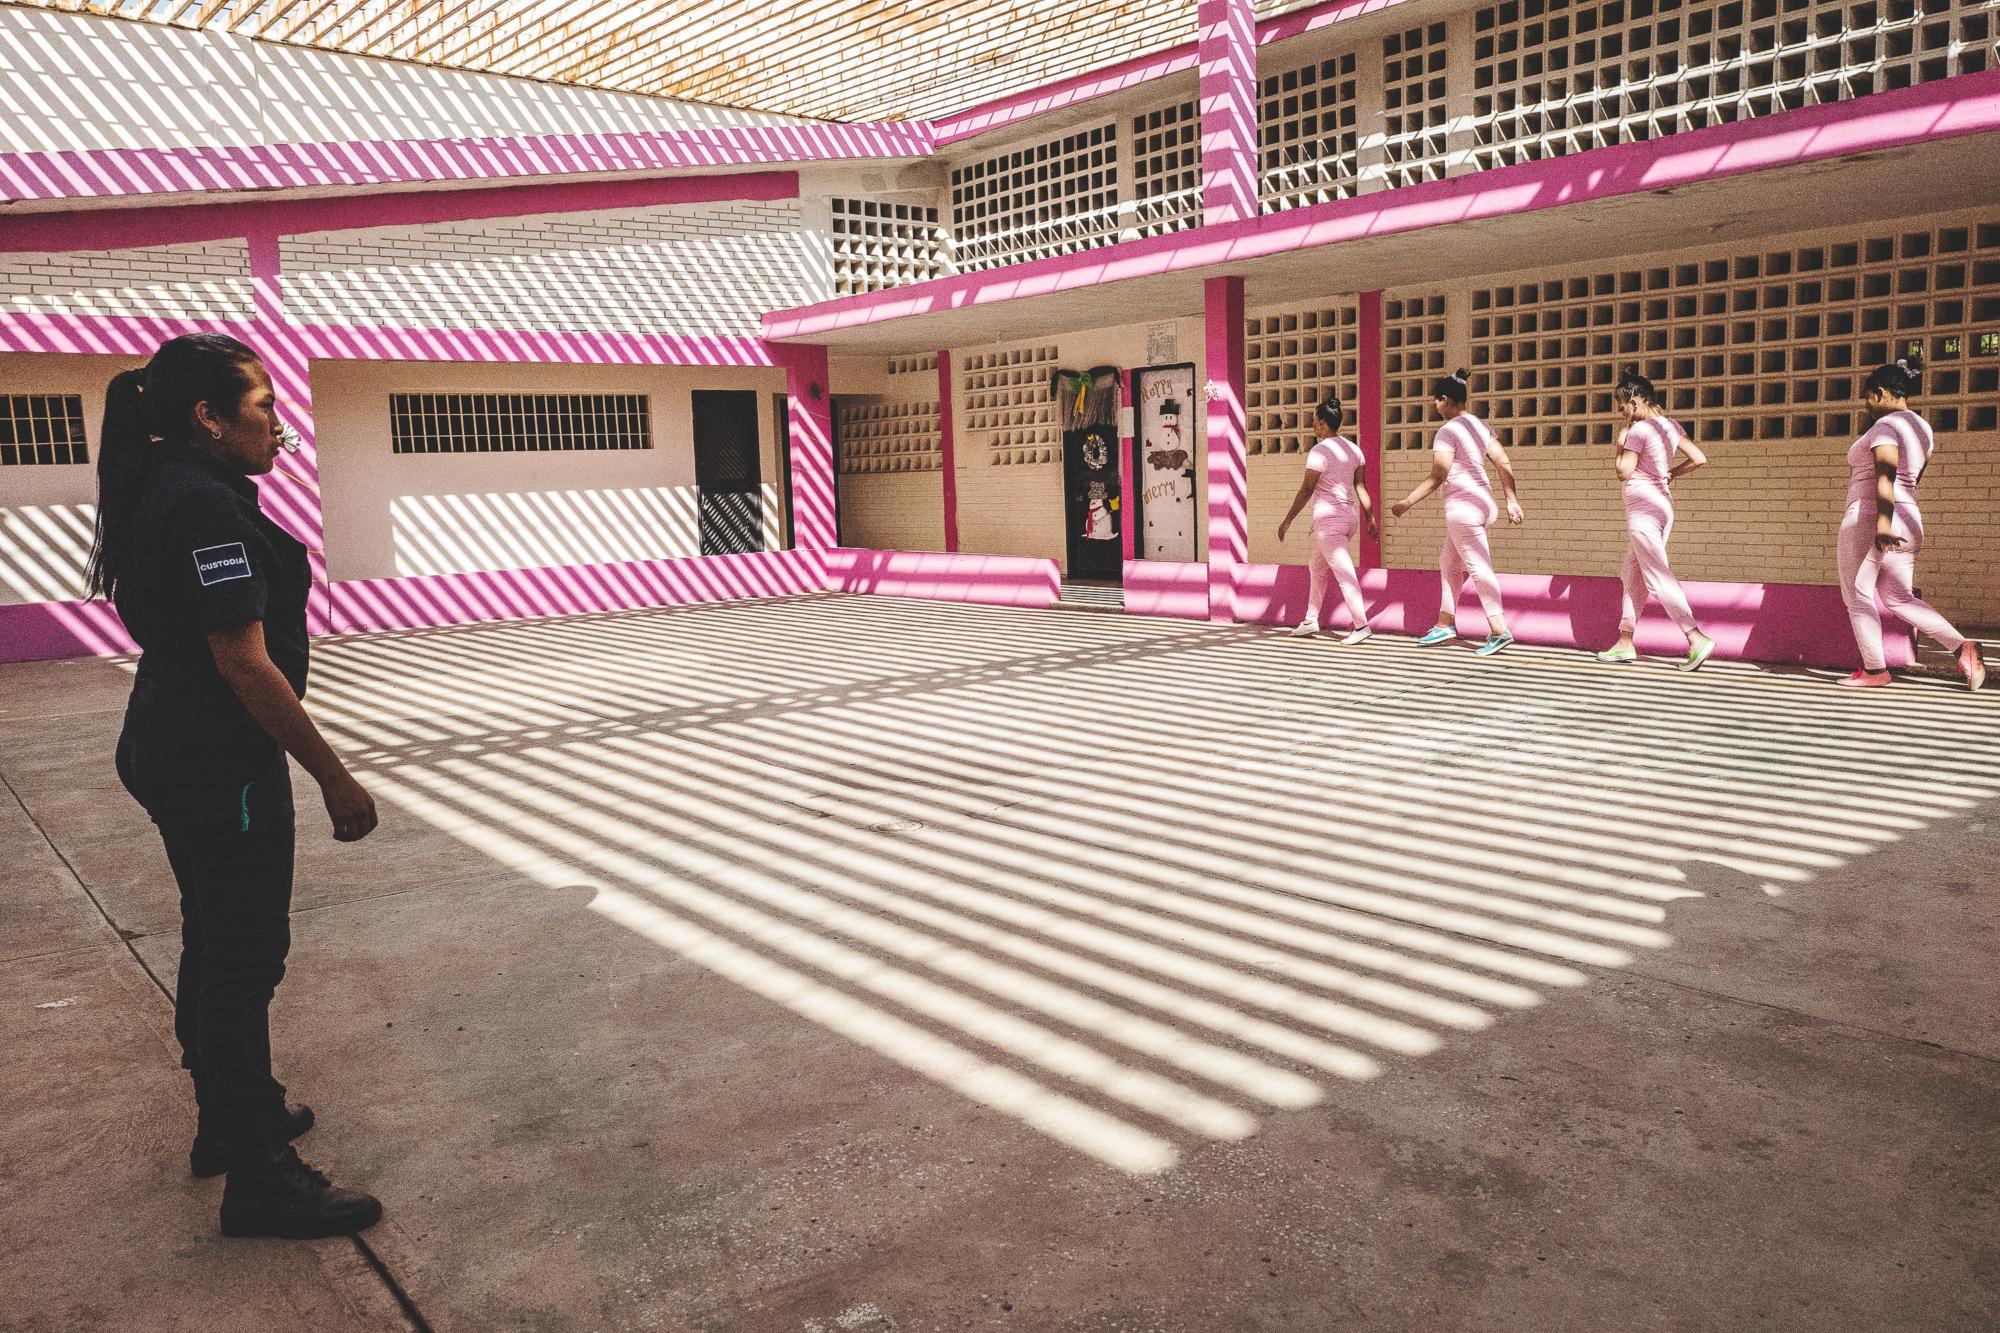 Visa pour l'image 2021 : exhibition Olivier Jobard, winner of the 2020 Camille Lepage award – Ana Maria Arevalo Gosen, winner 2021